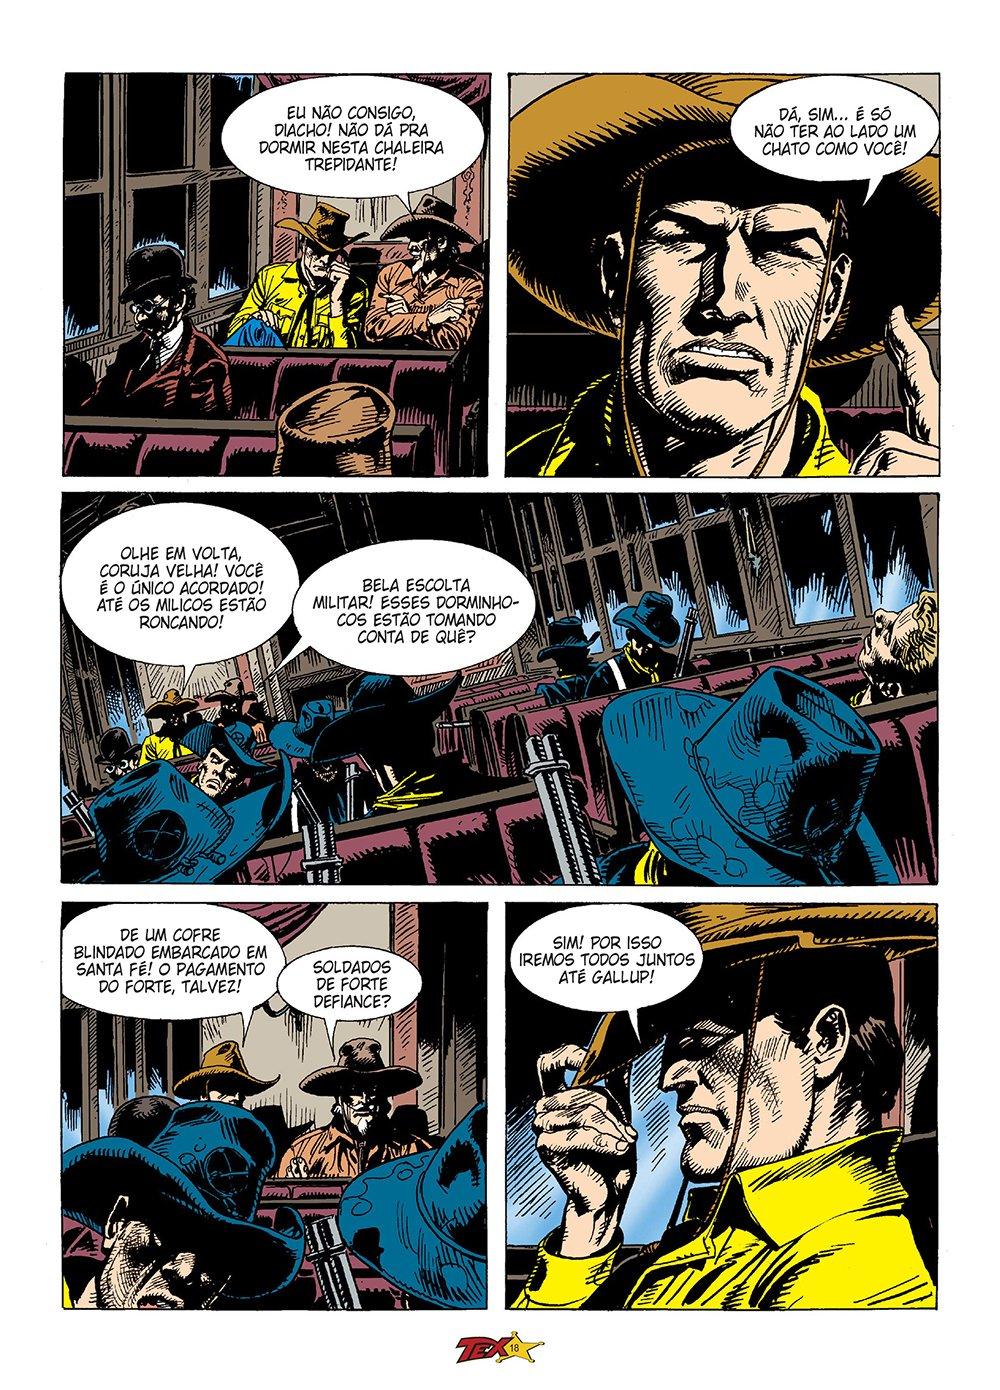 Tex. O Grande Roubo - Volume 6 (Em Portuguese do Brasil): Claudio Nizzi: 9788578671754: Amazon.com: Books